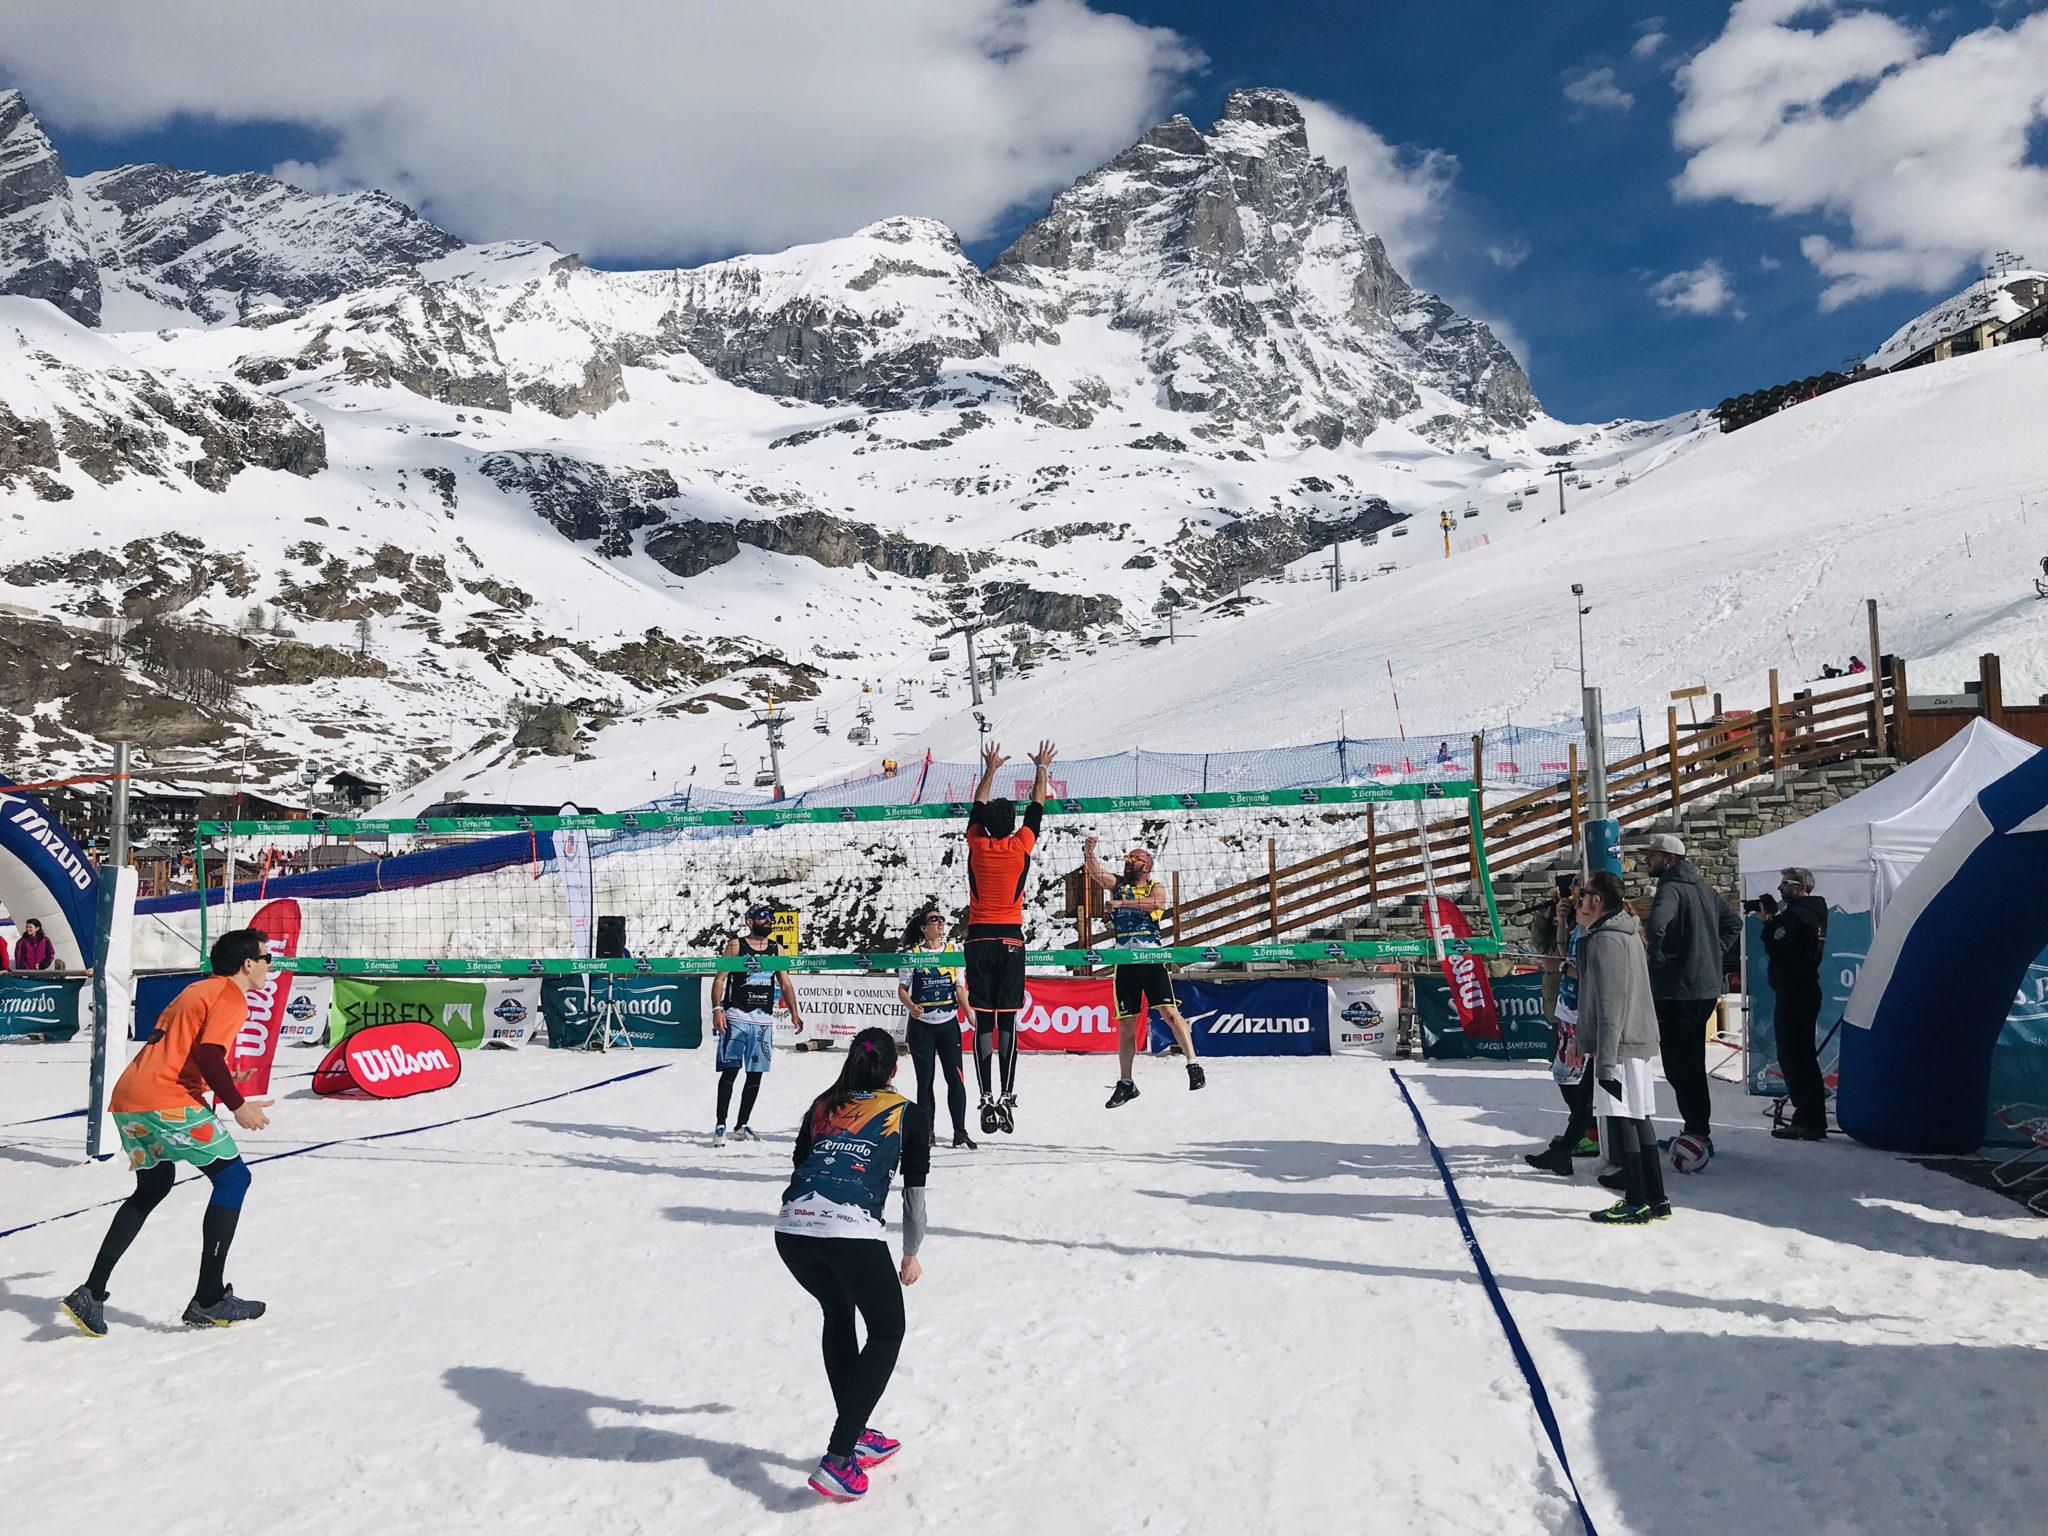 Breuil Cervinia Snow Volley